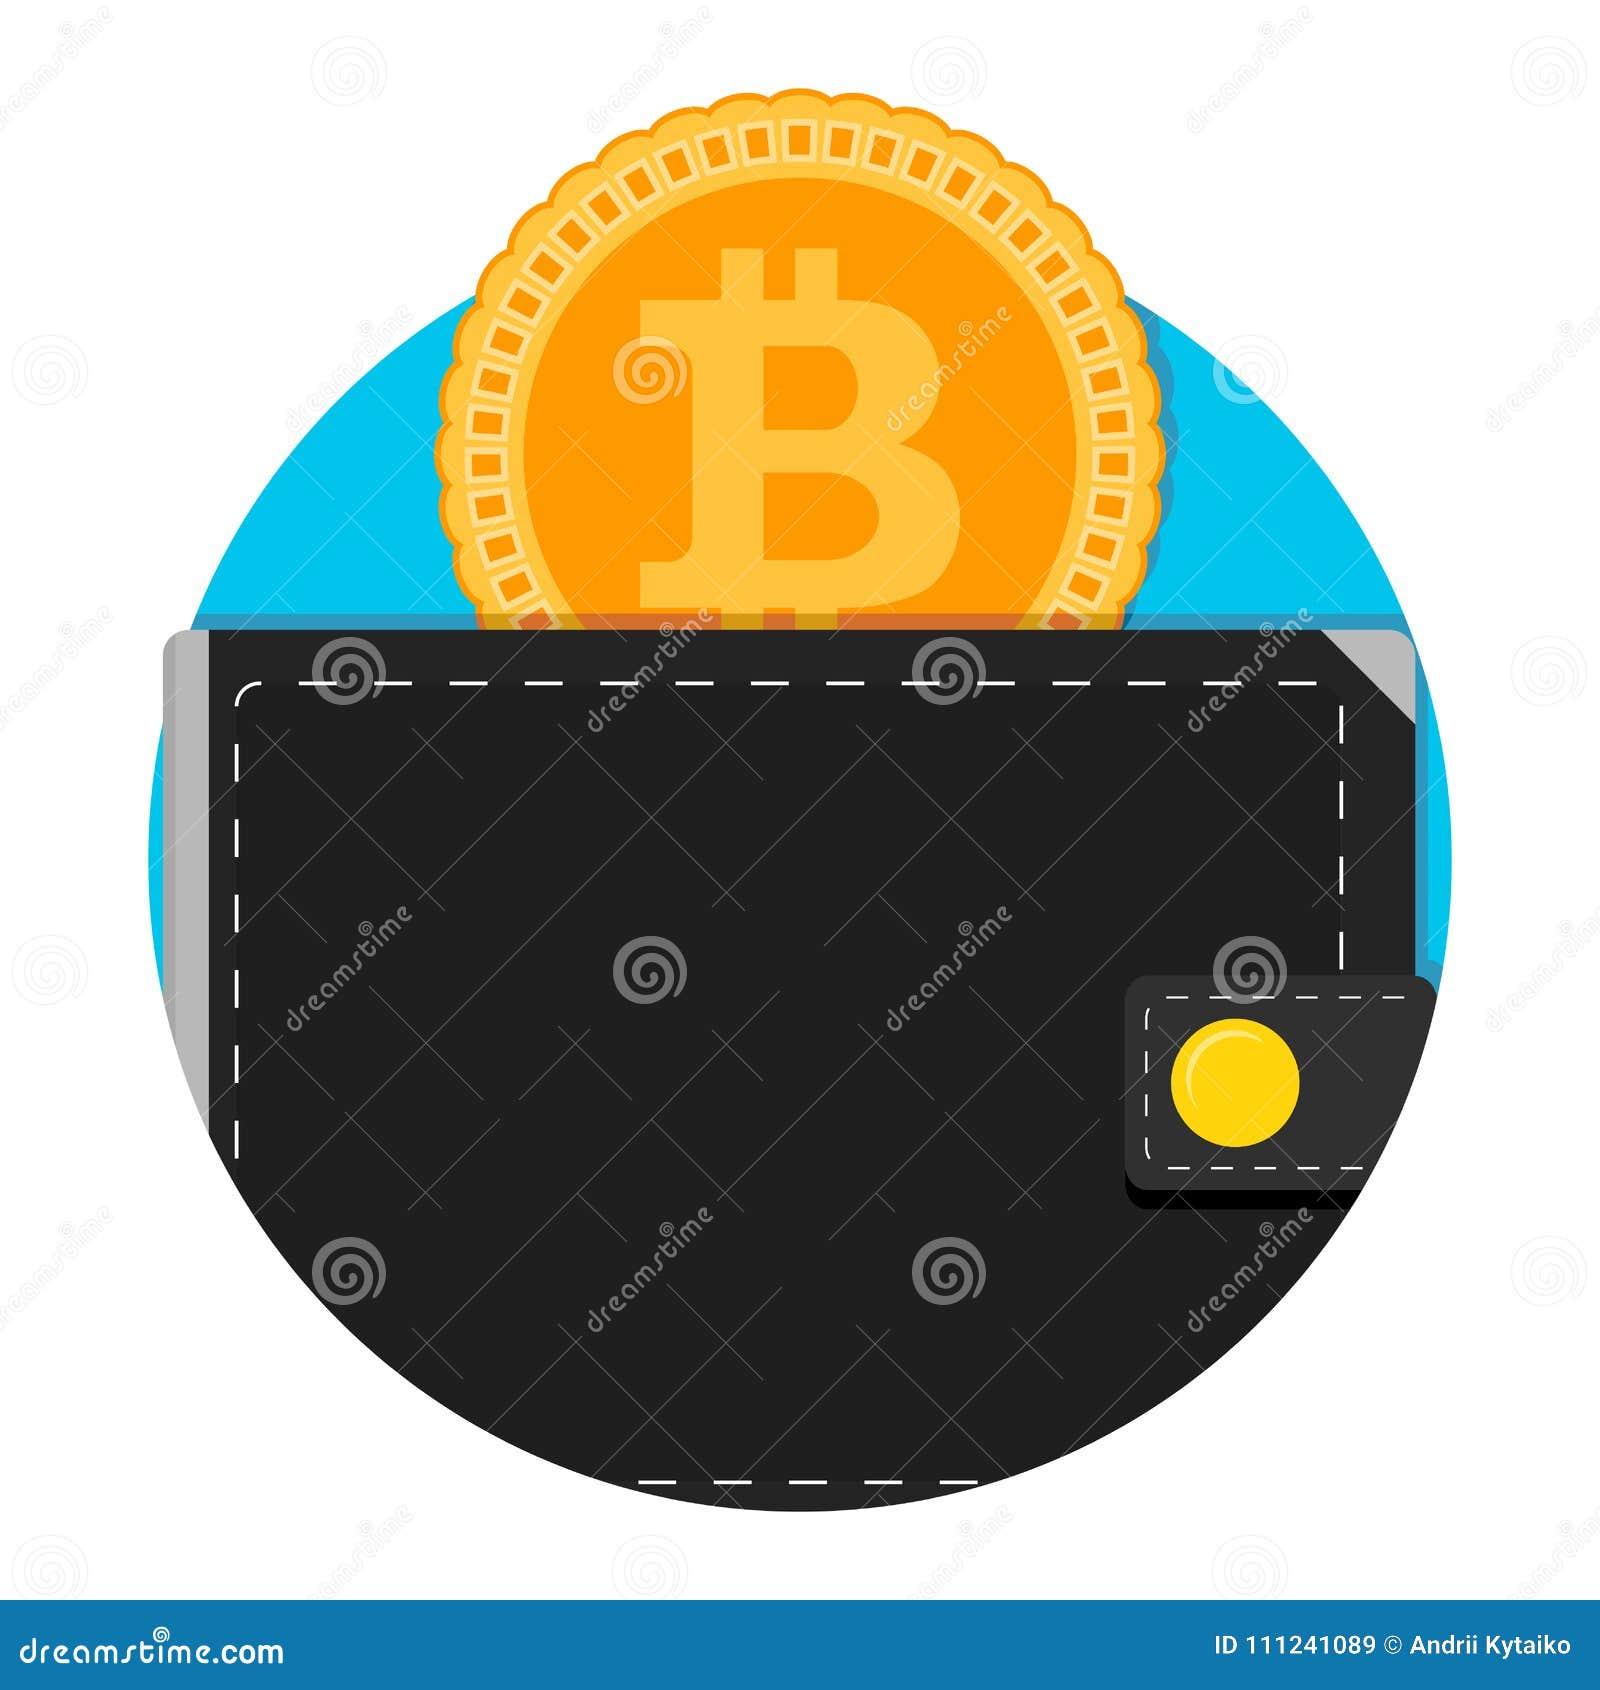 breakout trading bitcoin